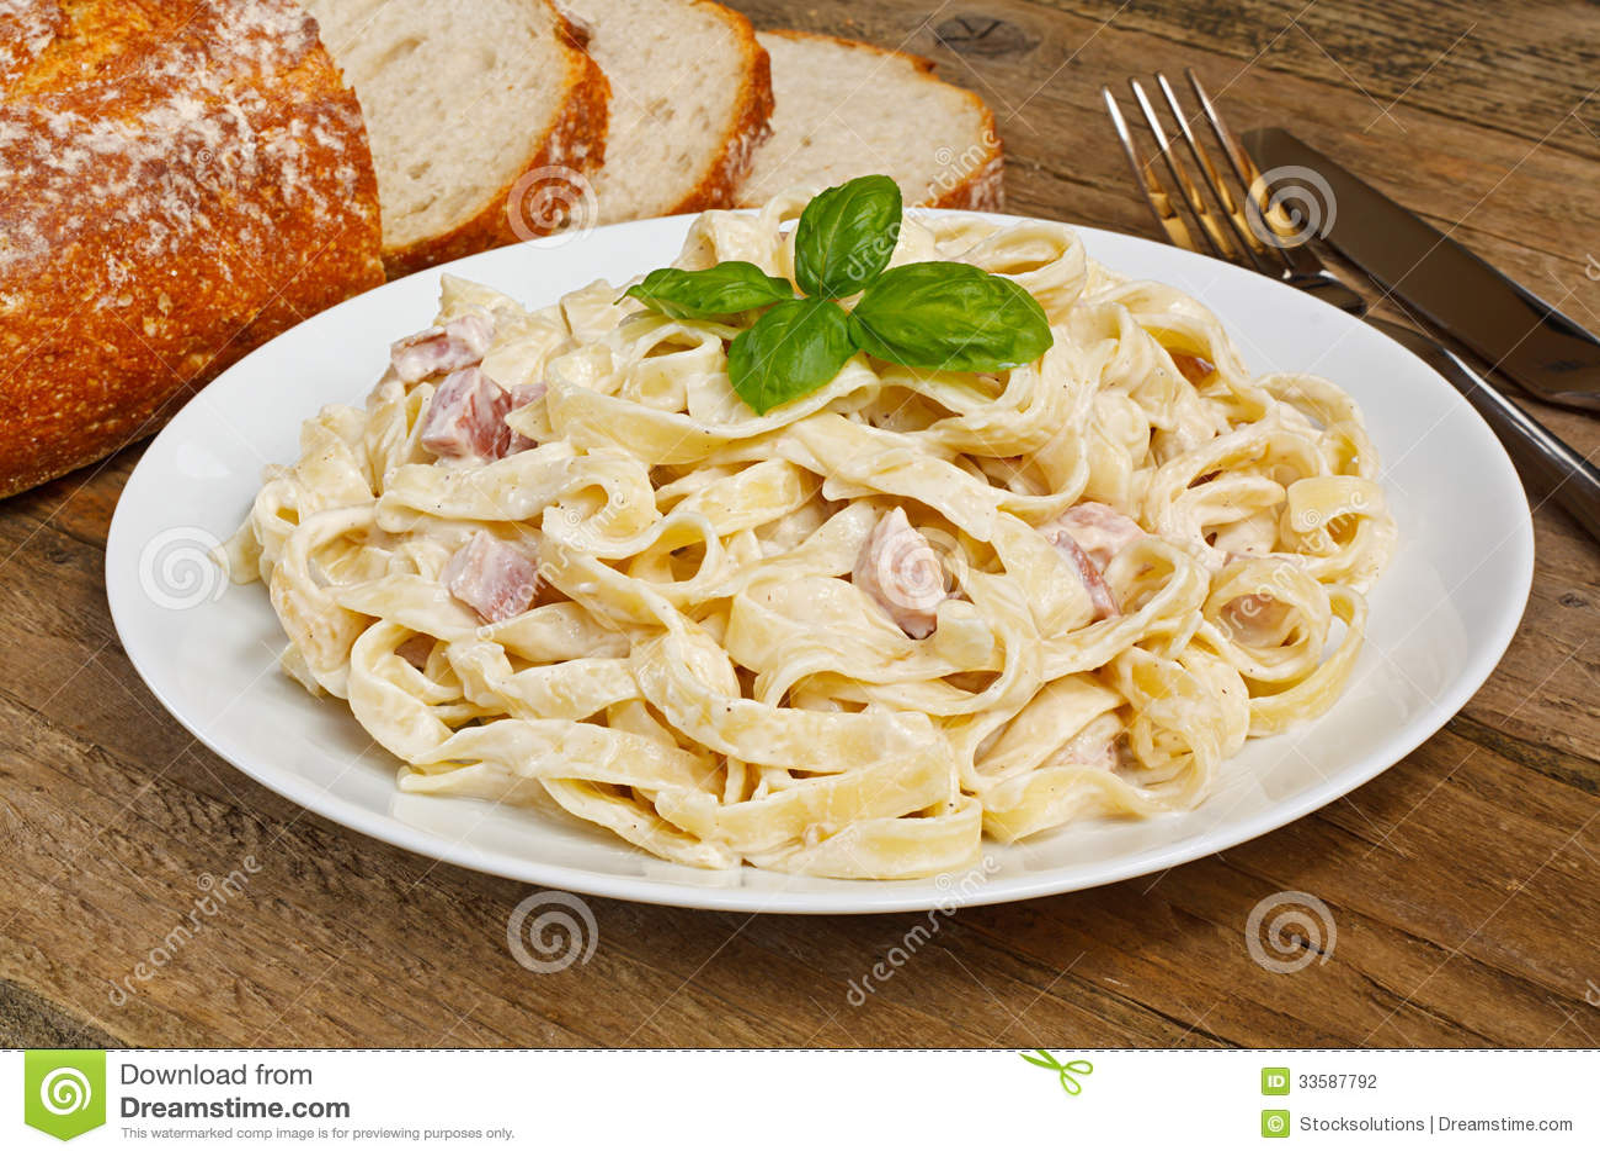 pasta carbonara plate tagliatelli italian food rustic restaurant setting 33587792